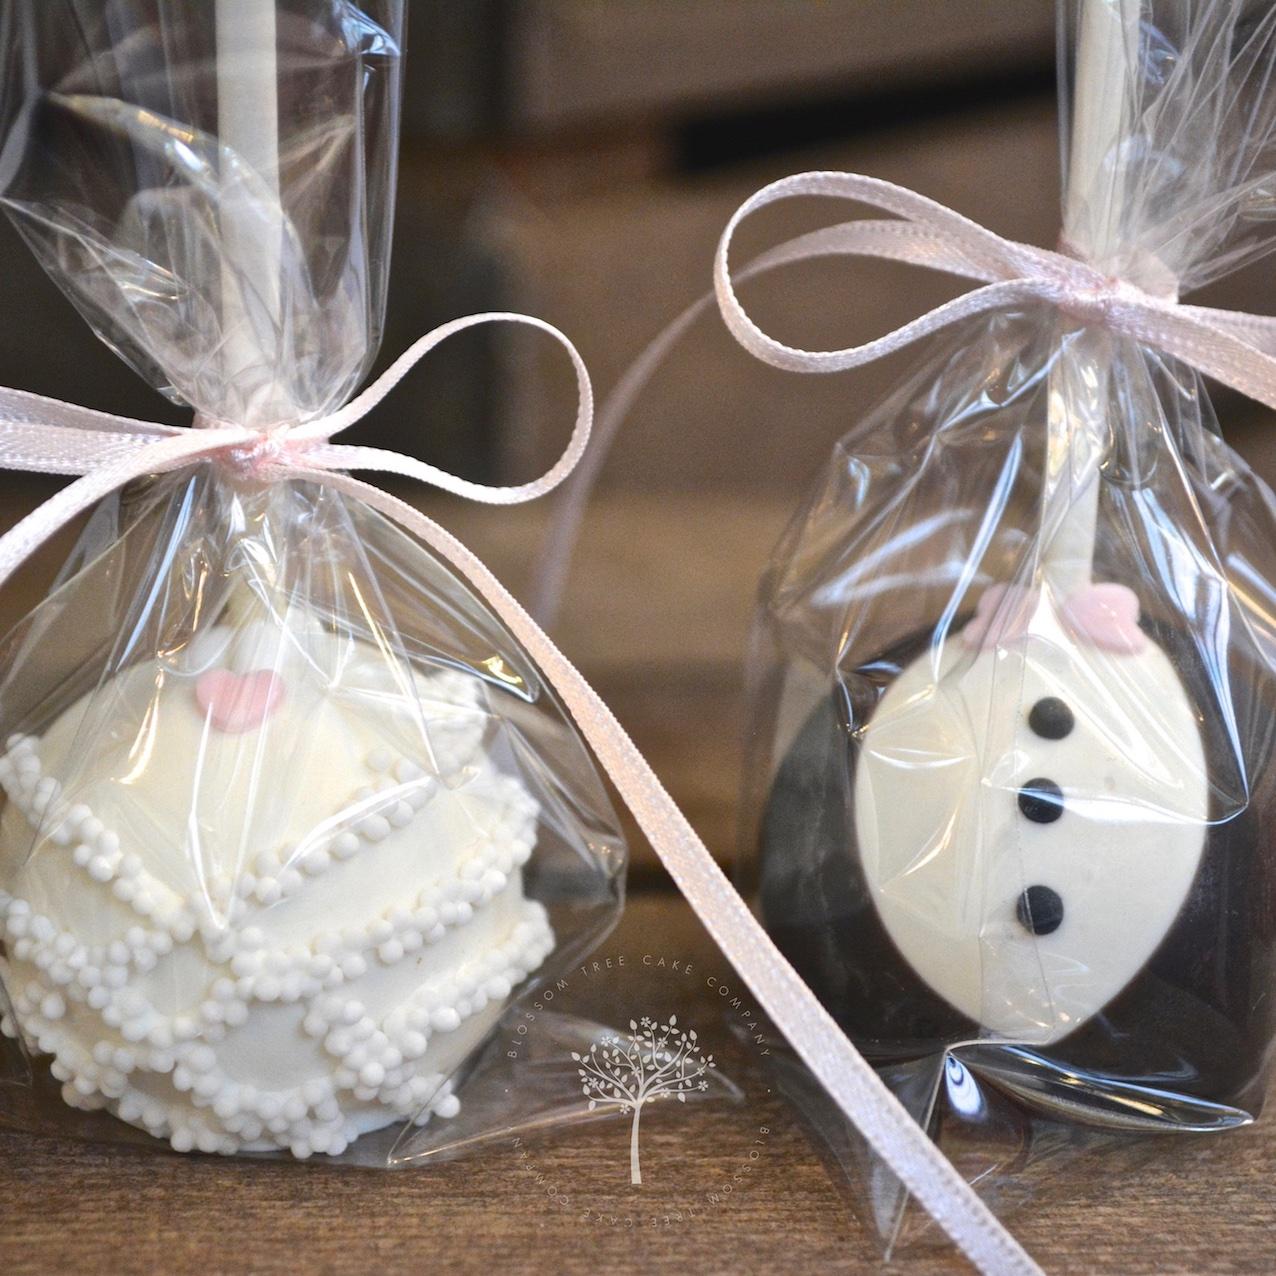 Bride and Groom Cake Pops by Blossom Tree Cake Company Harrogate North Yorkshire - square.jpg